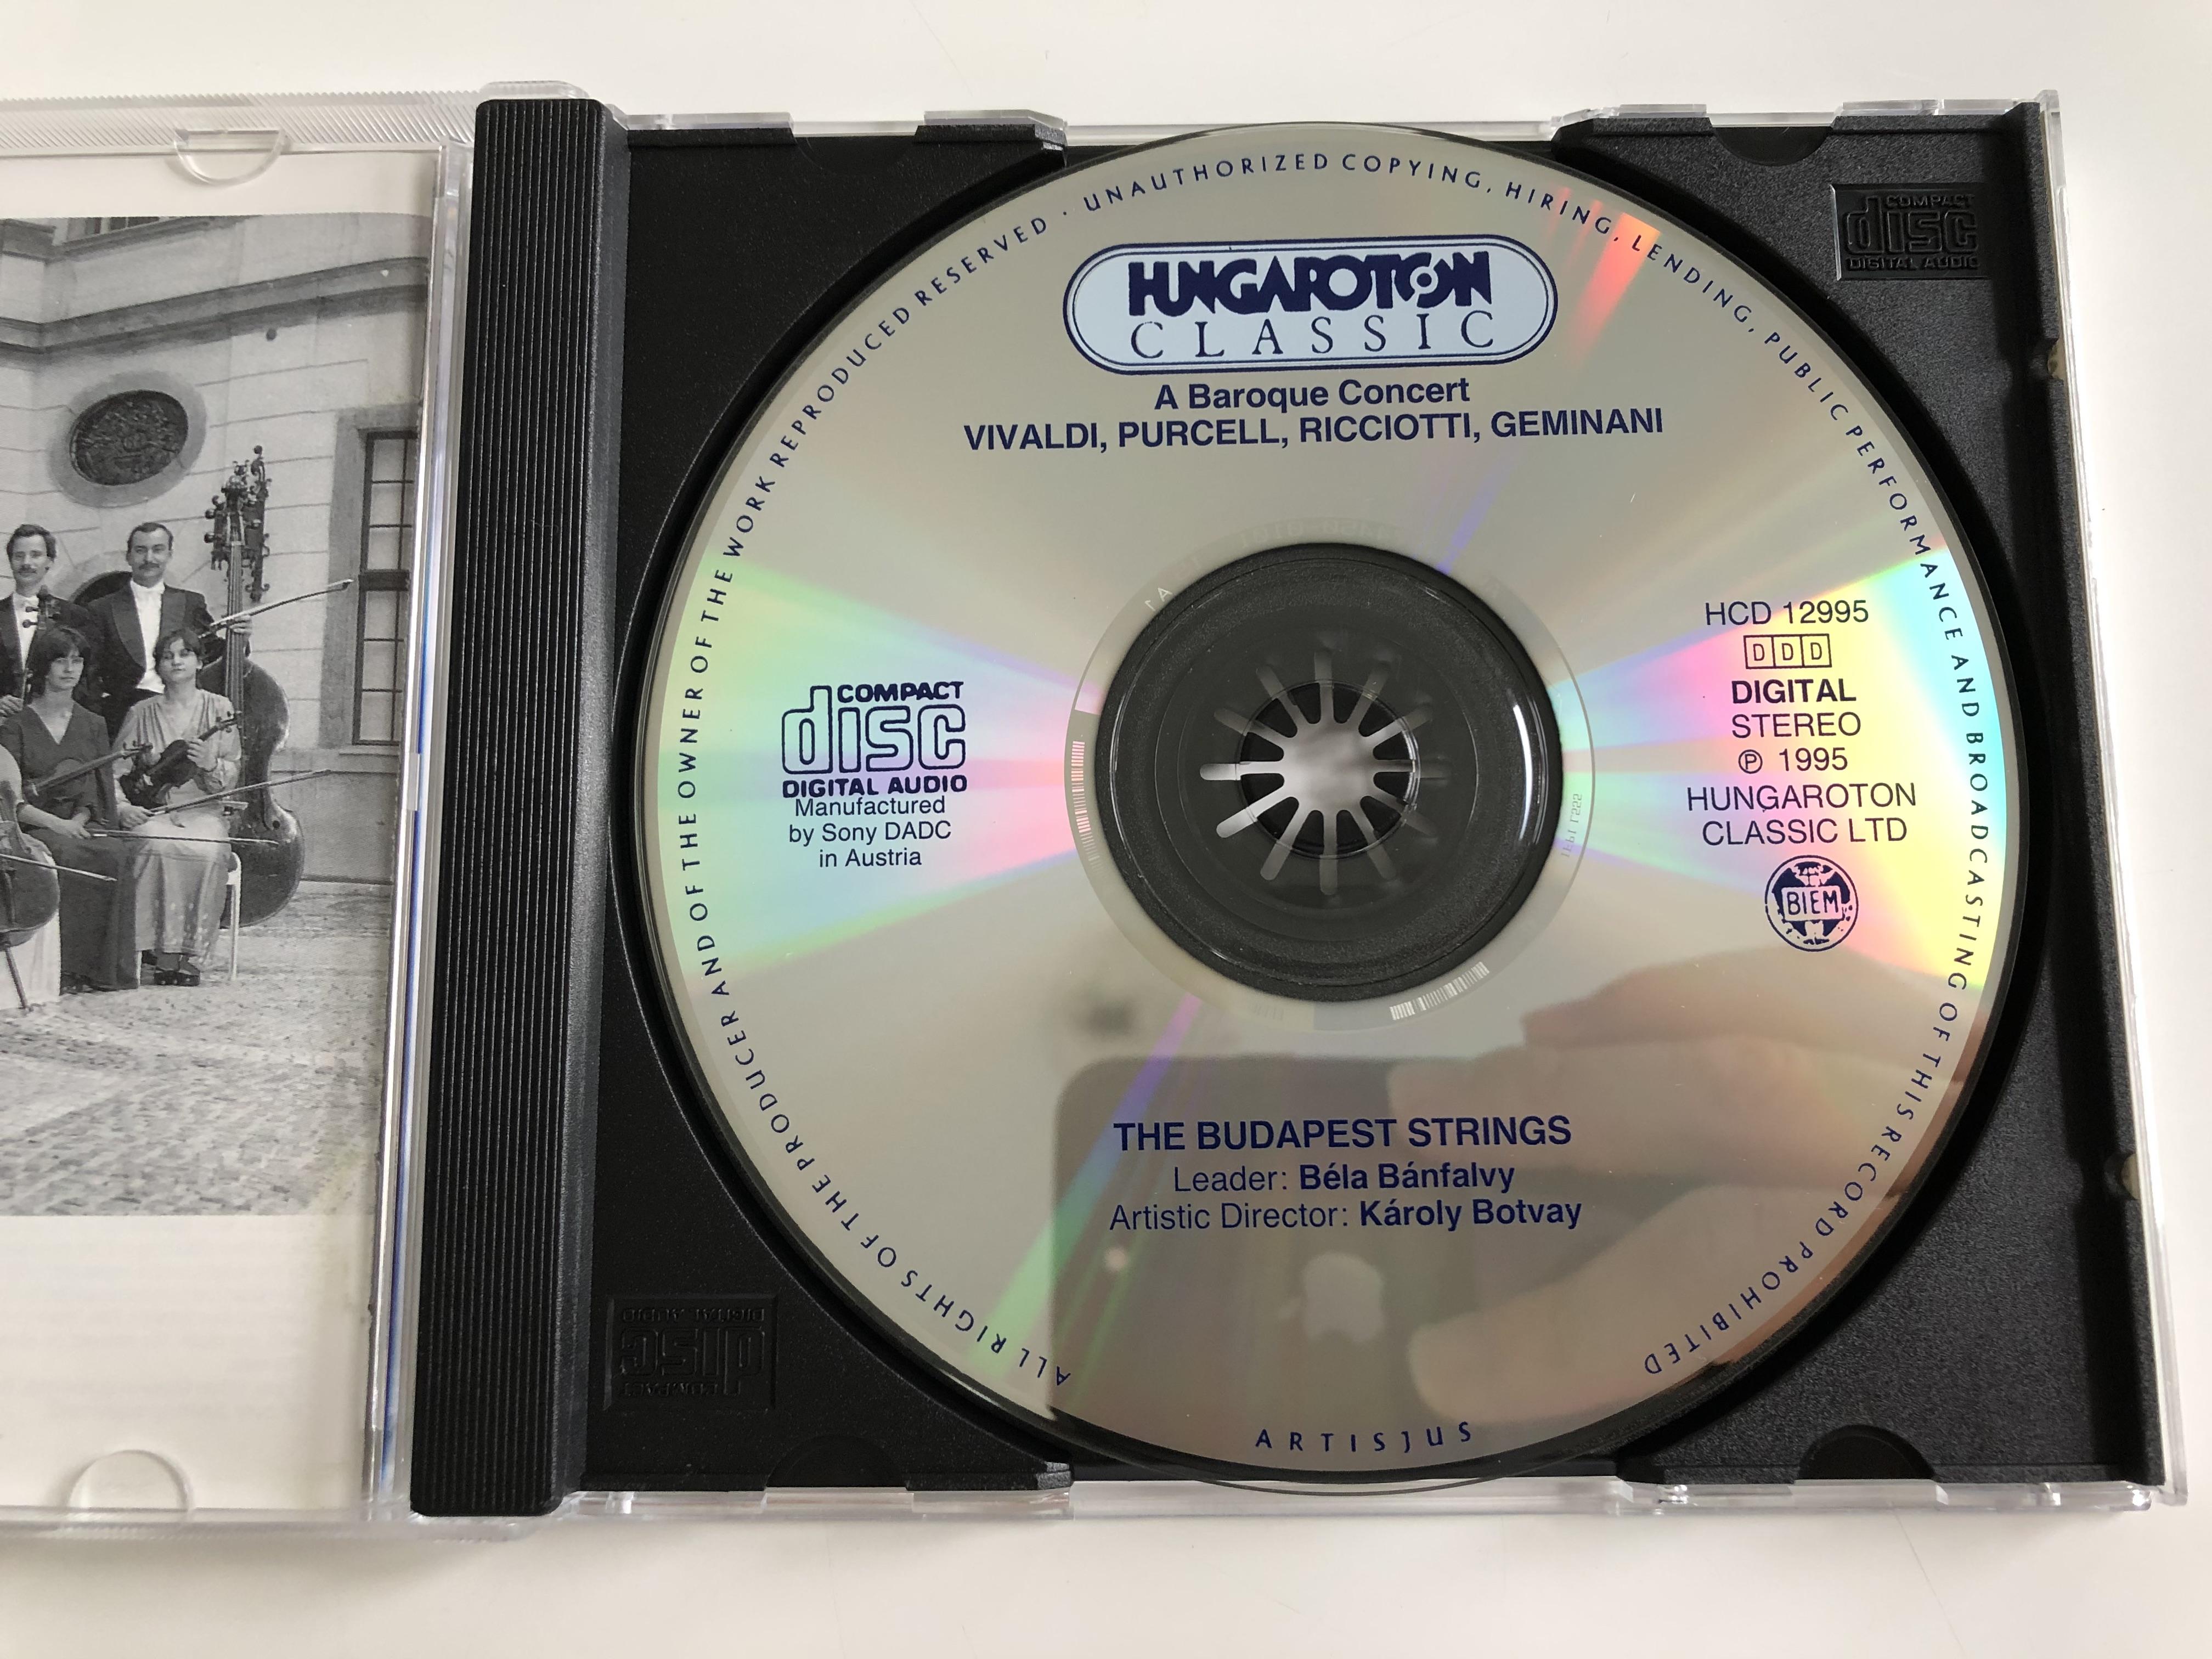 a-baroque-concert-vivaldi-purcell-geminiani-the-budapest-strings-leader-b-la-b-nfalvi-directed-by-k-roly-botvay-hungaroton-audio-cd-1995-stereo-hcd-12995-8-.jpg